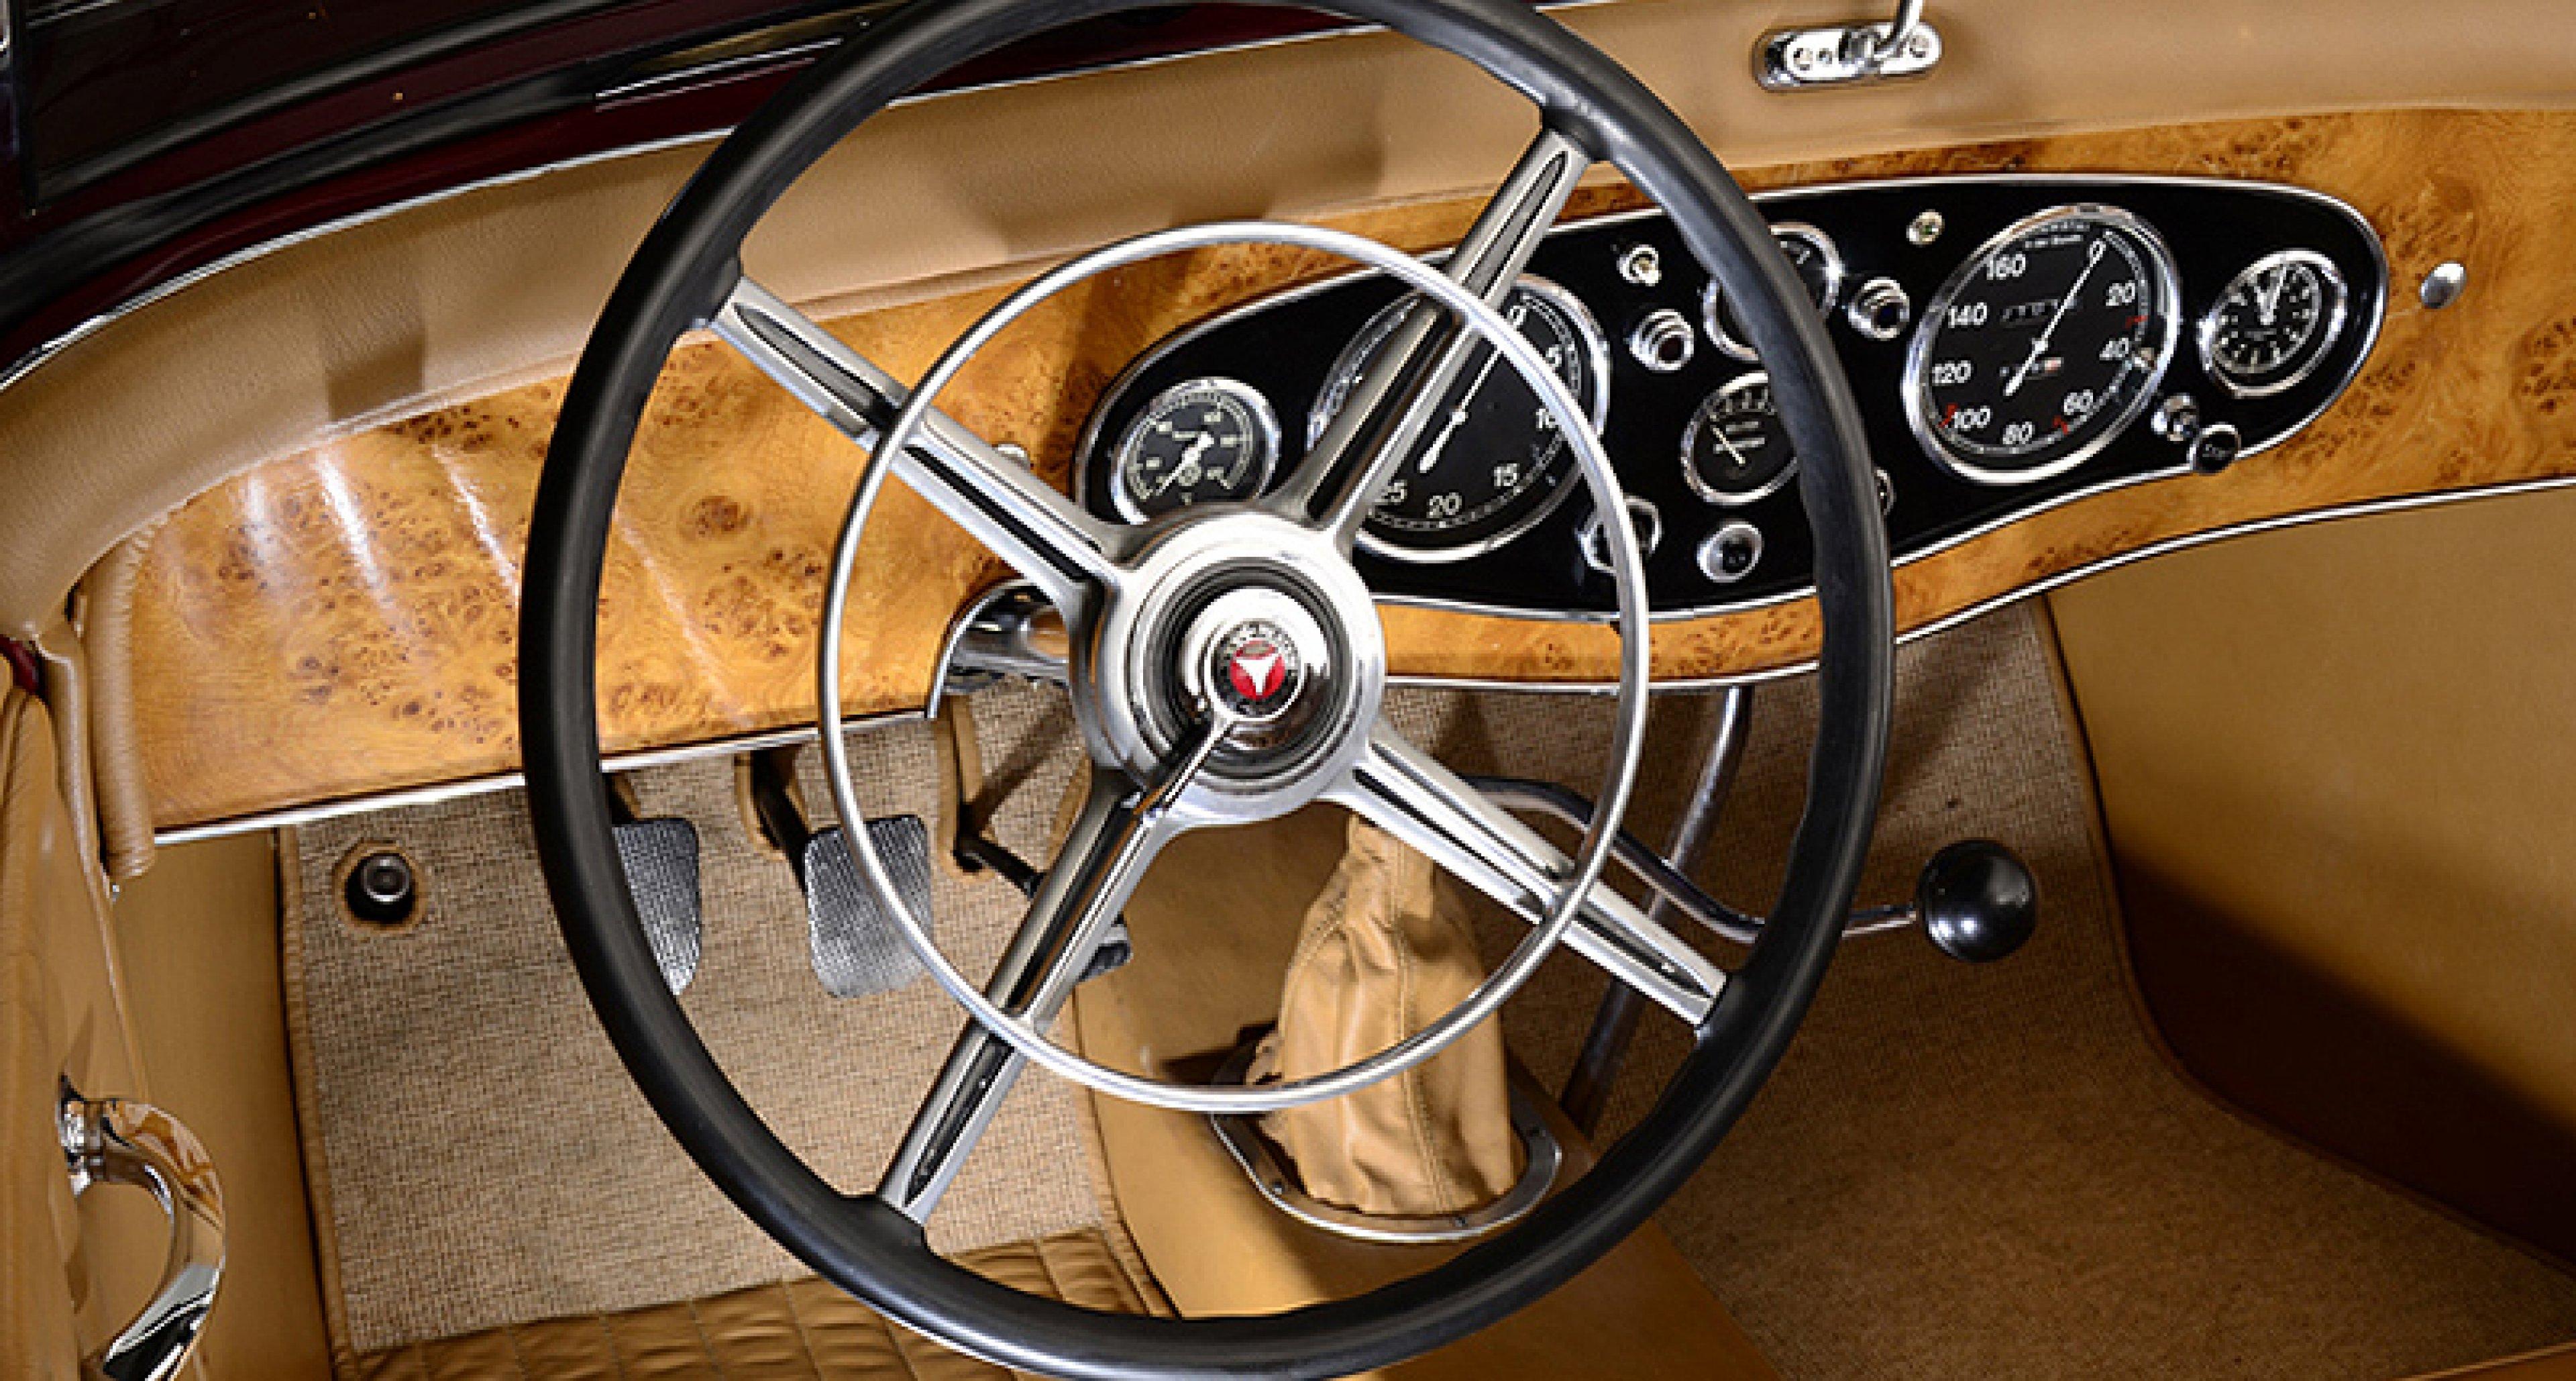 Kidston to Sell Gunter Sachs' Mercedes-Benz 380 Roadster